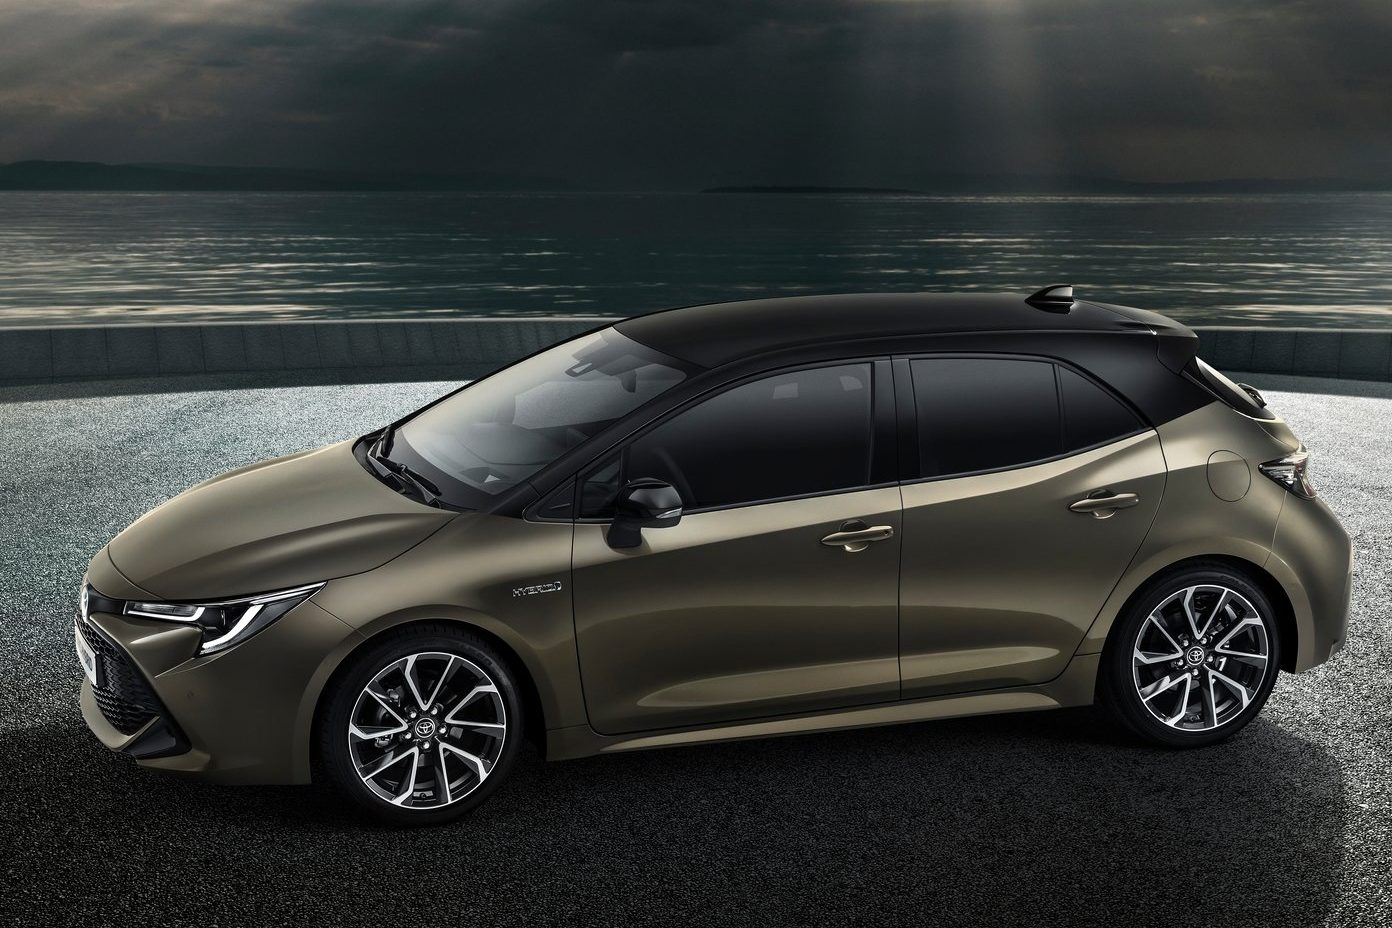 Toyota Auris Antecipa Novo Corolla Híbrido Nacional Quatro Rodas